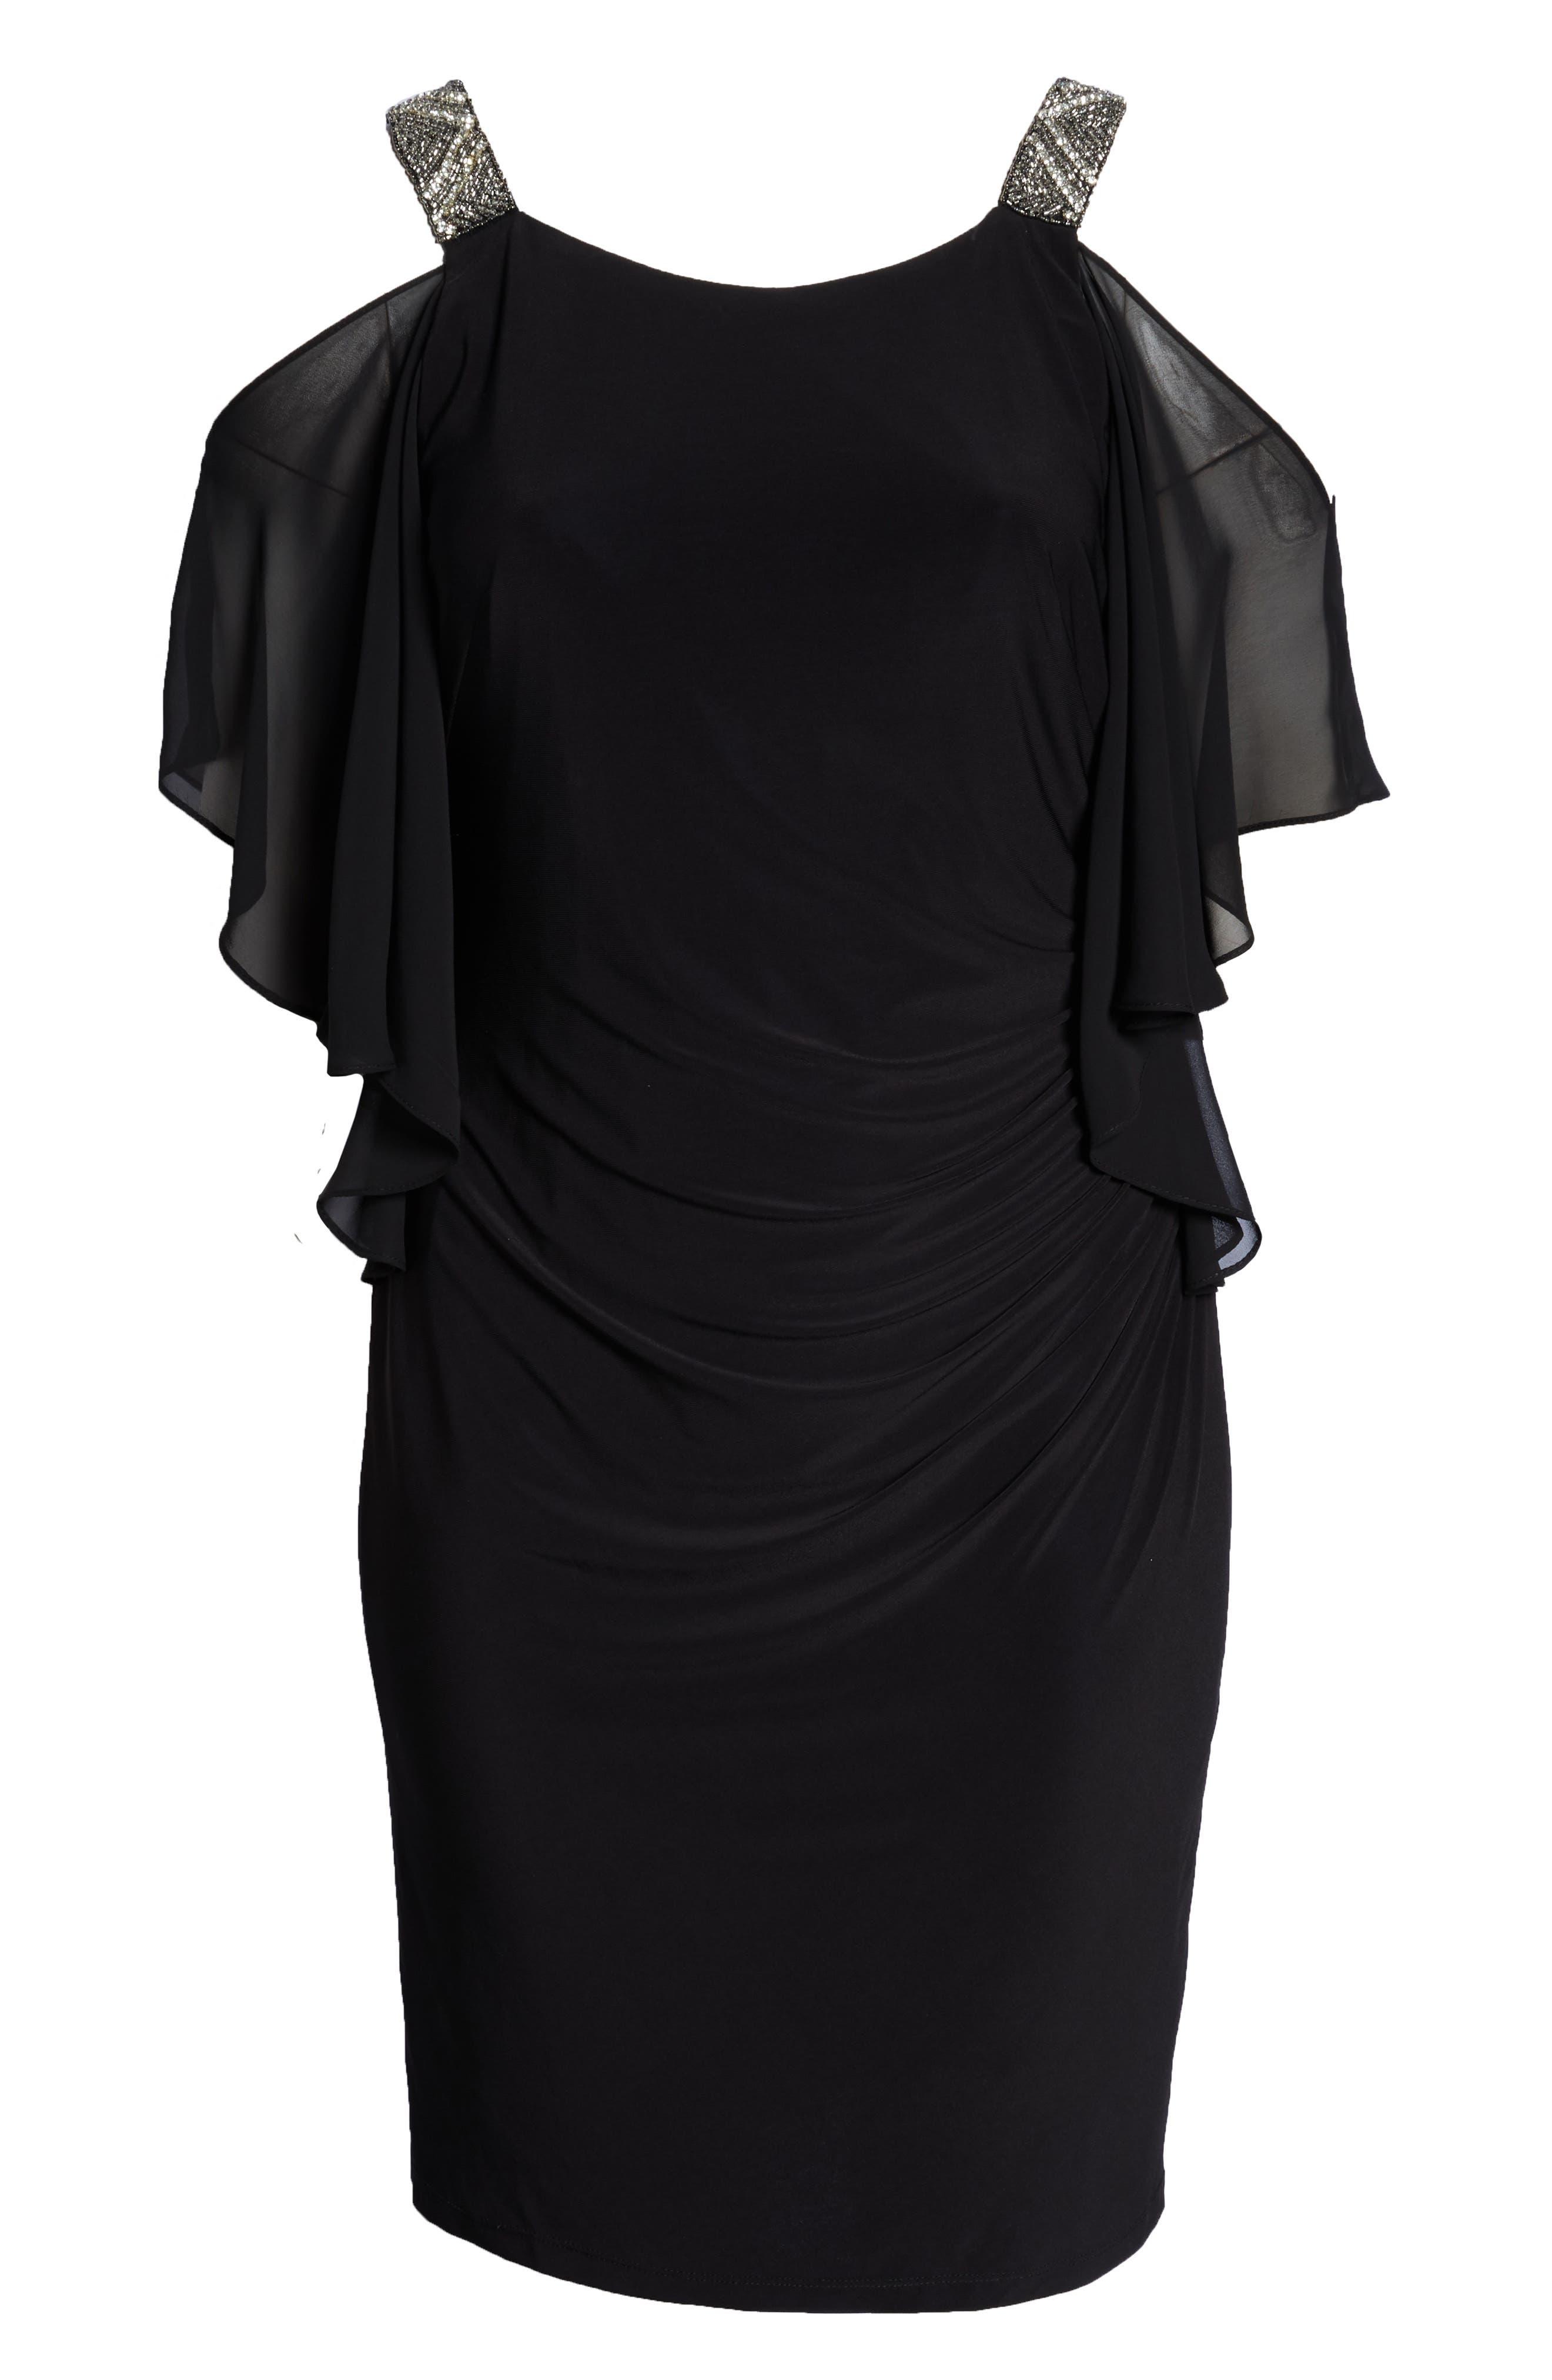 Cold Shoulder Sparkle Dress,                             Alternate thumbnail 7, color,                             BLACK/ SILVER